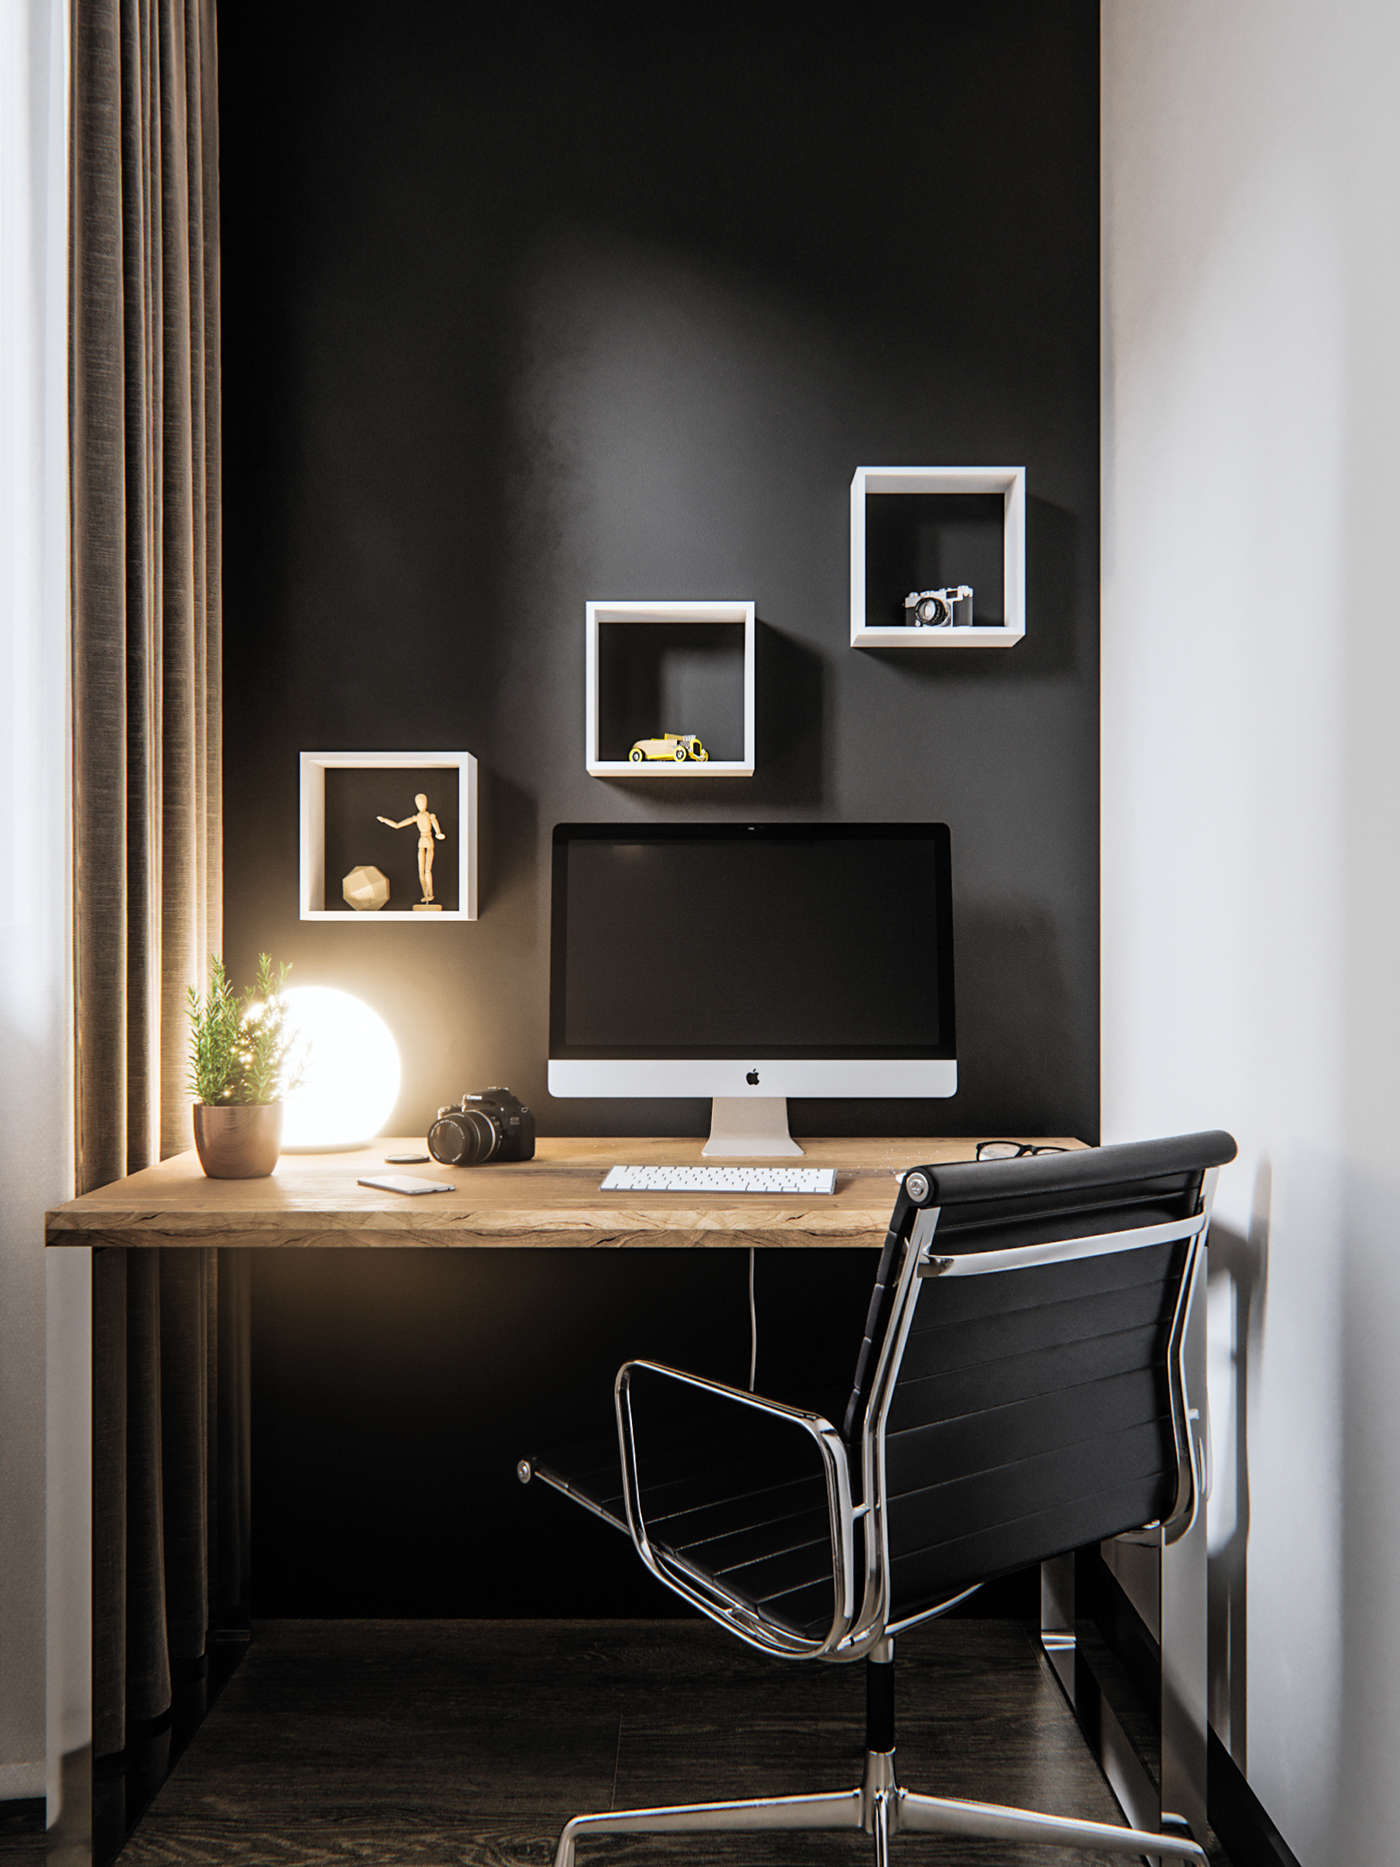 studio apartment of 45 sq.m. on behance